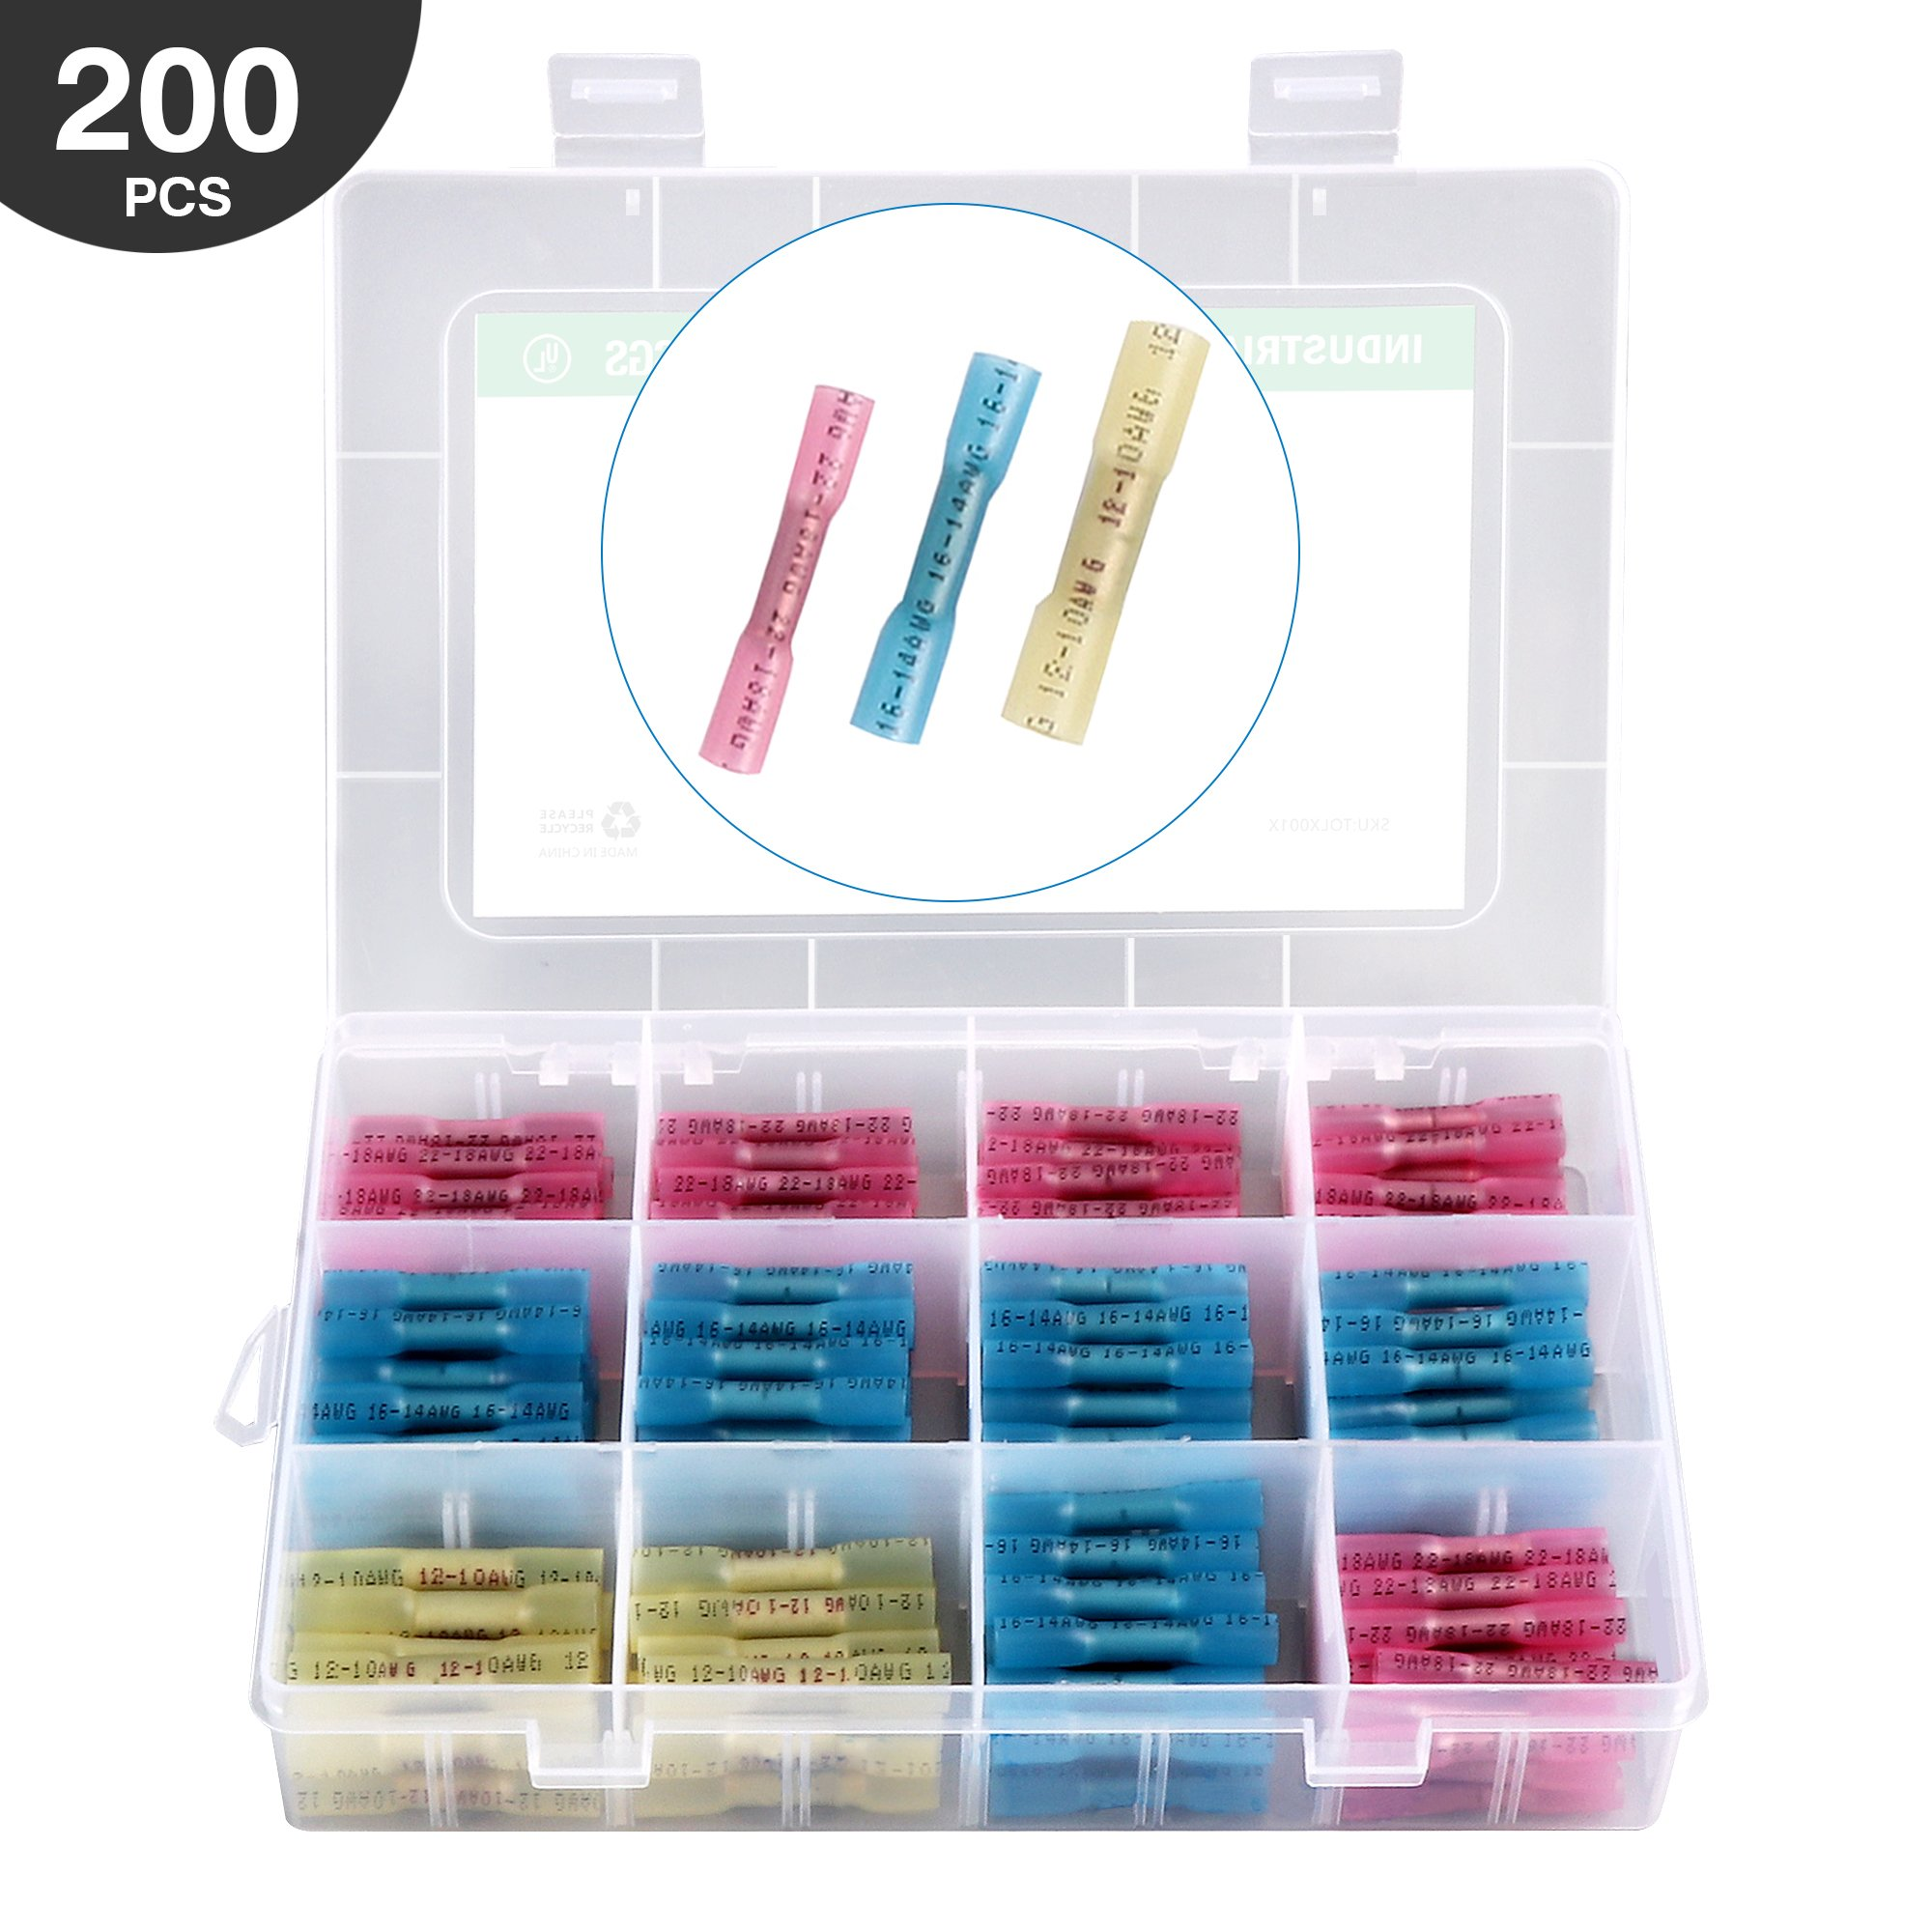 Heat Shrink Tubing, Nozama Heat Shrink Tubing Kit 200 Pcs Pvc Heat-Shrink Tubes 3 Colors 5 Sizes Electric Insulation Tube Kit With Box